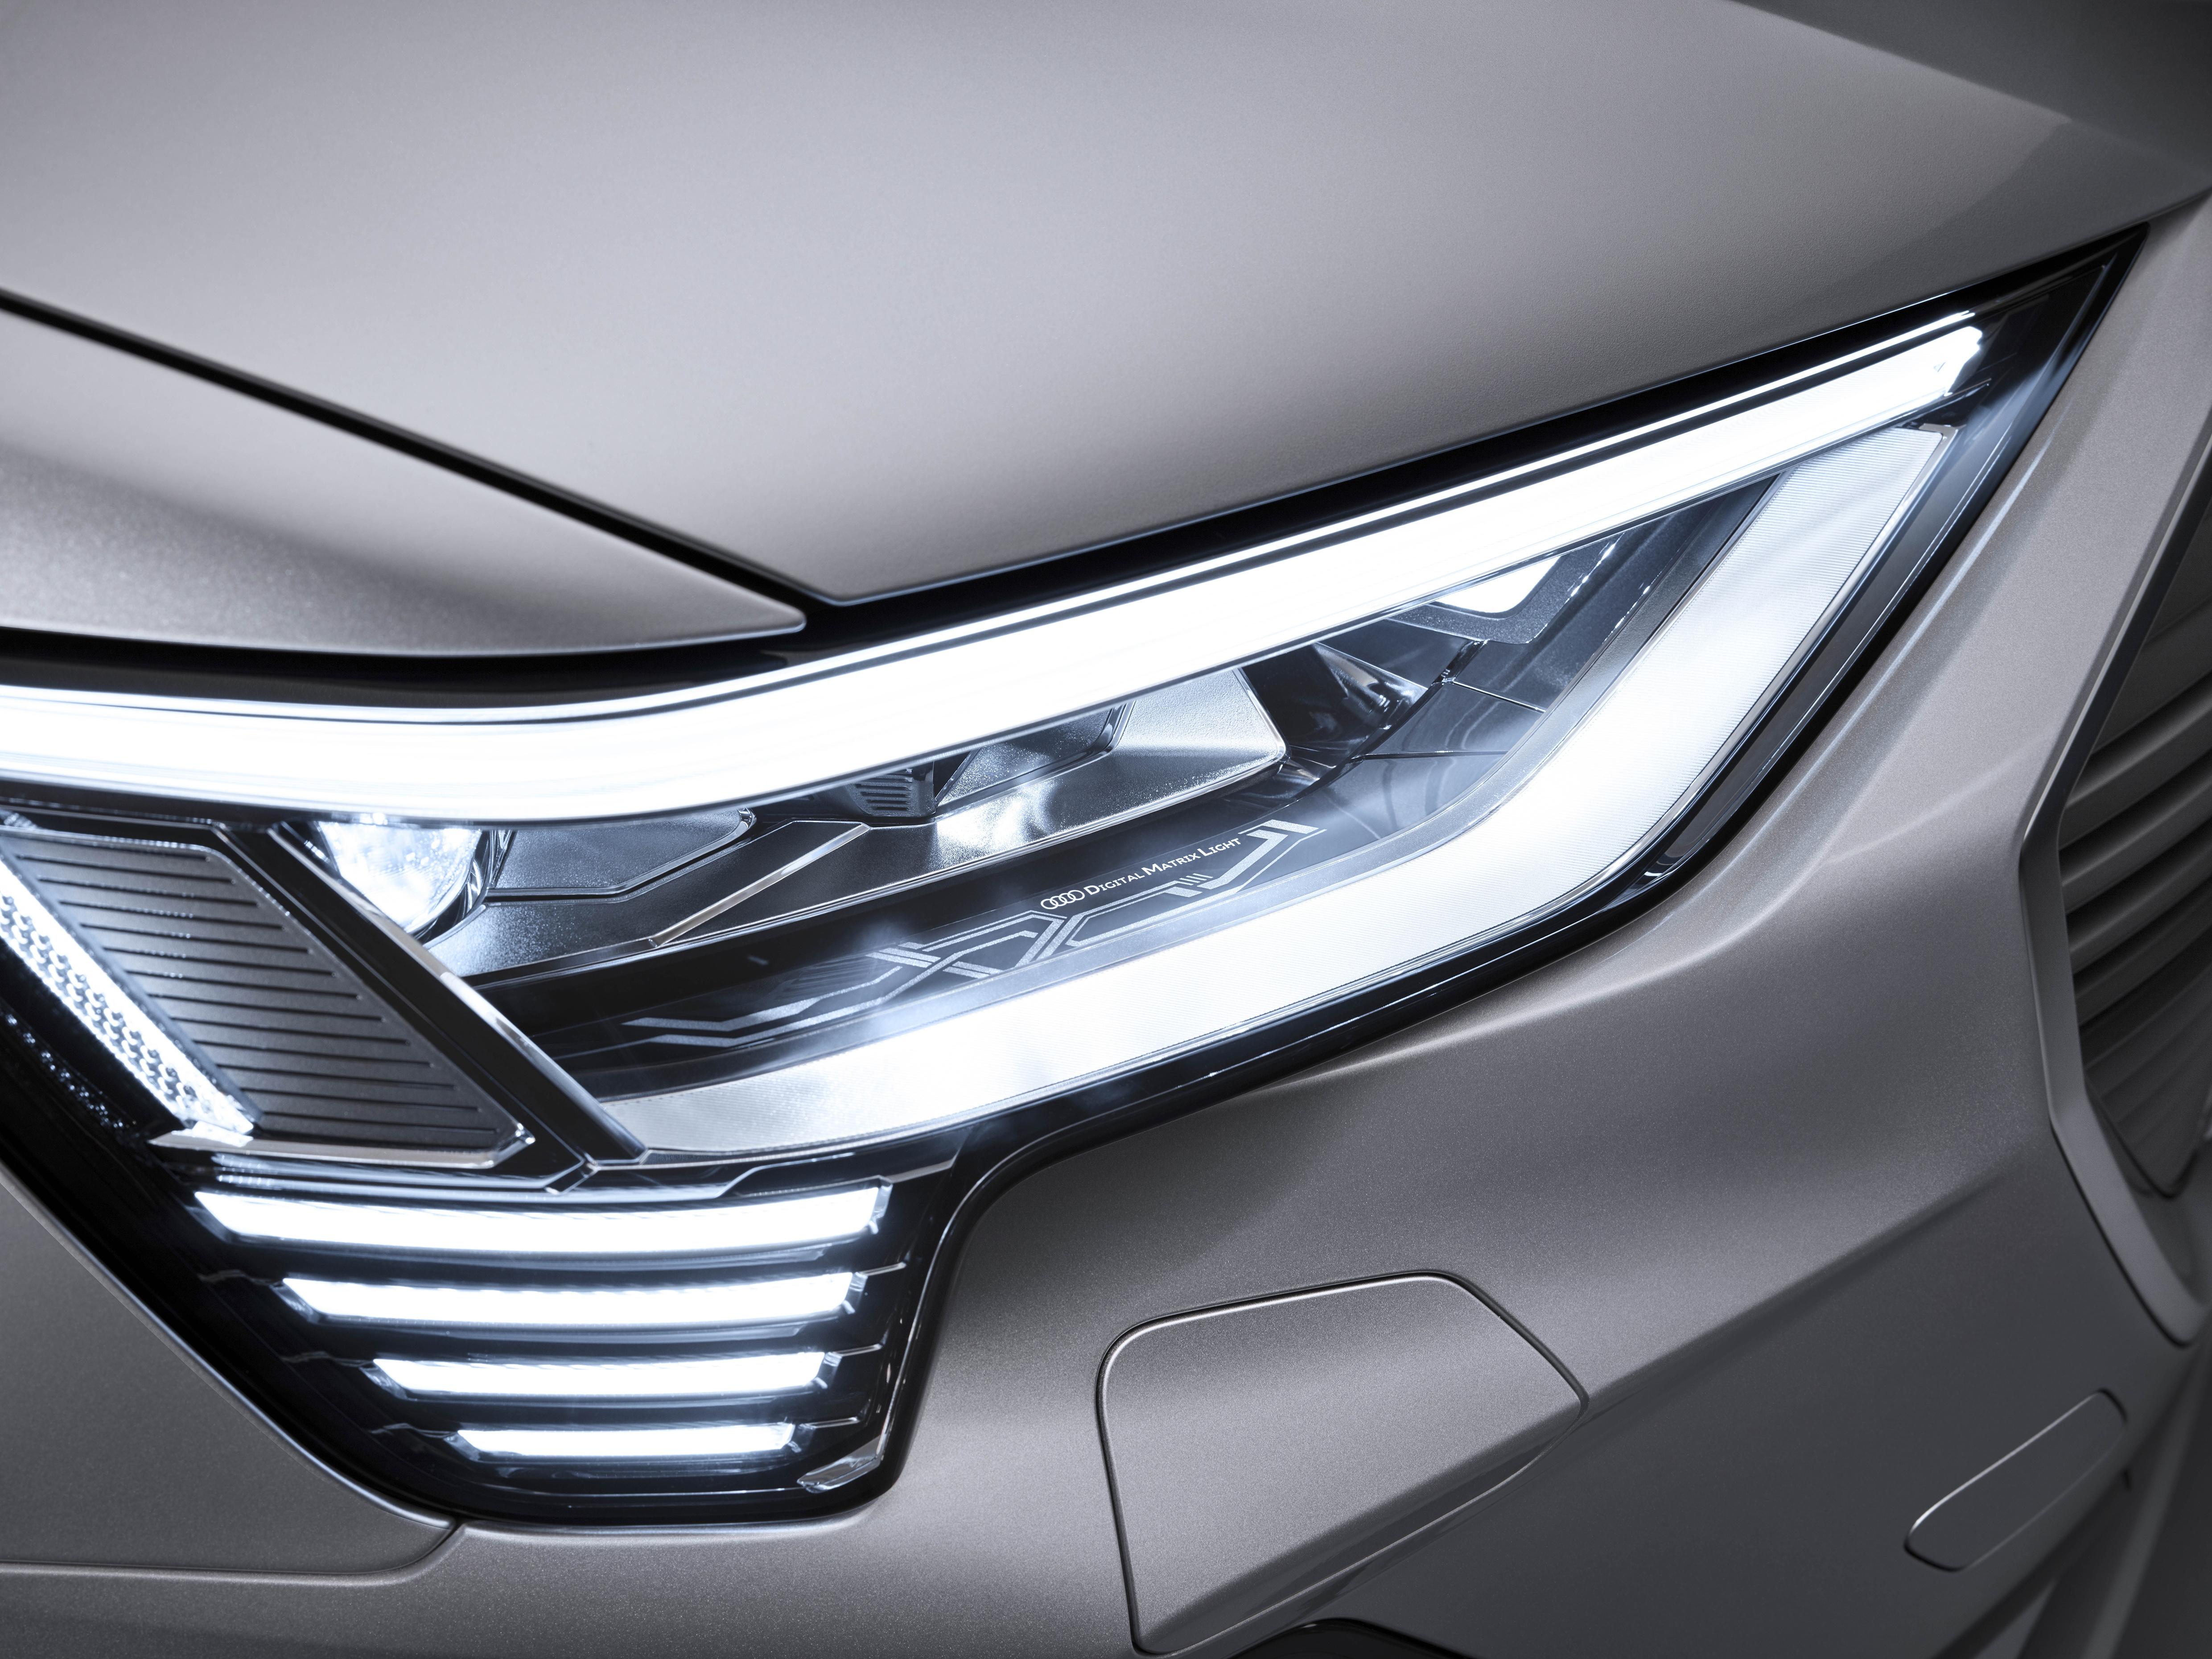 Die digitalen Matrix LED-Scheinwerfer des Audi e-tron Sportback. (AUDI)